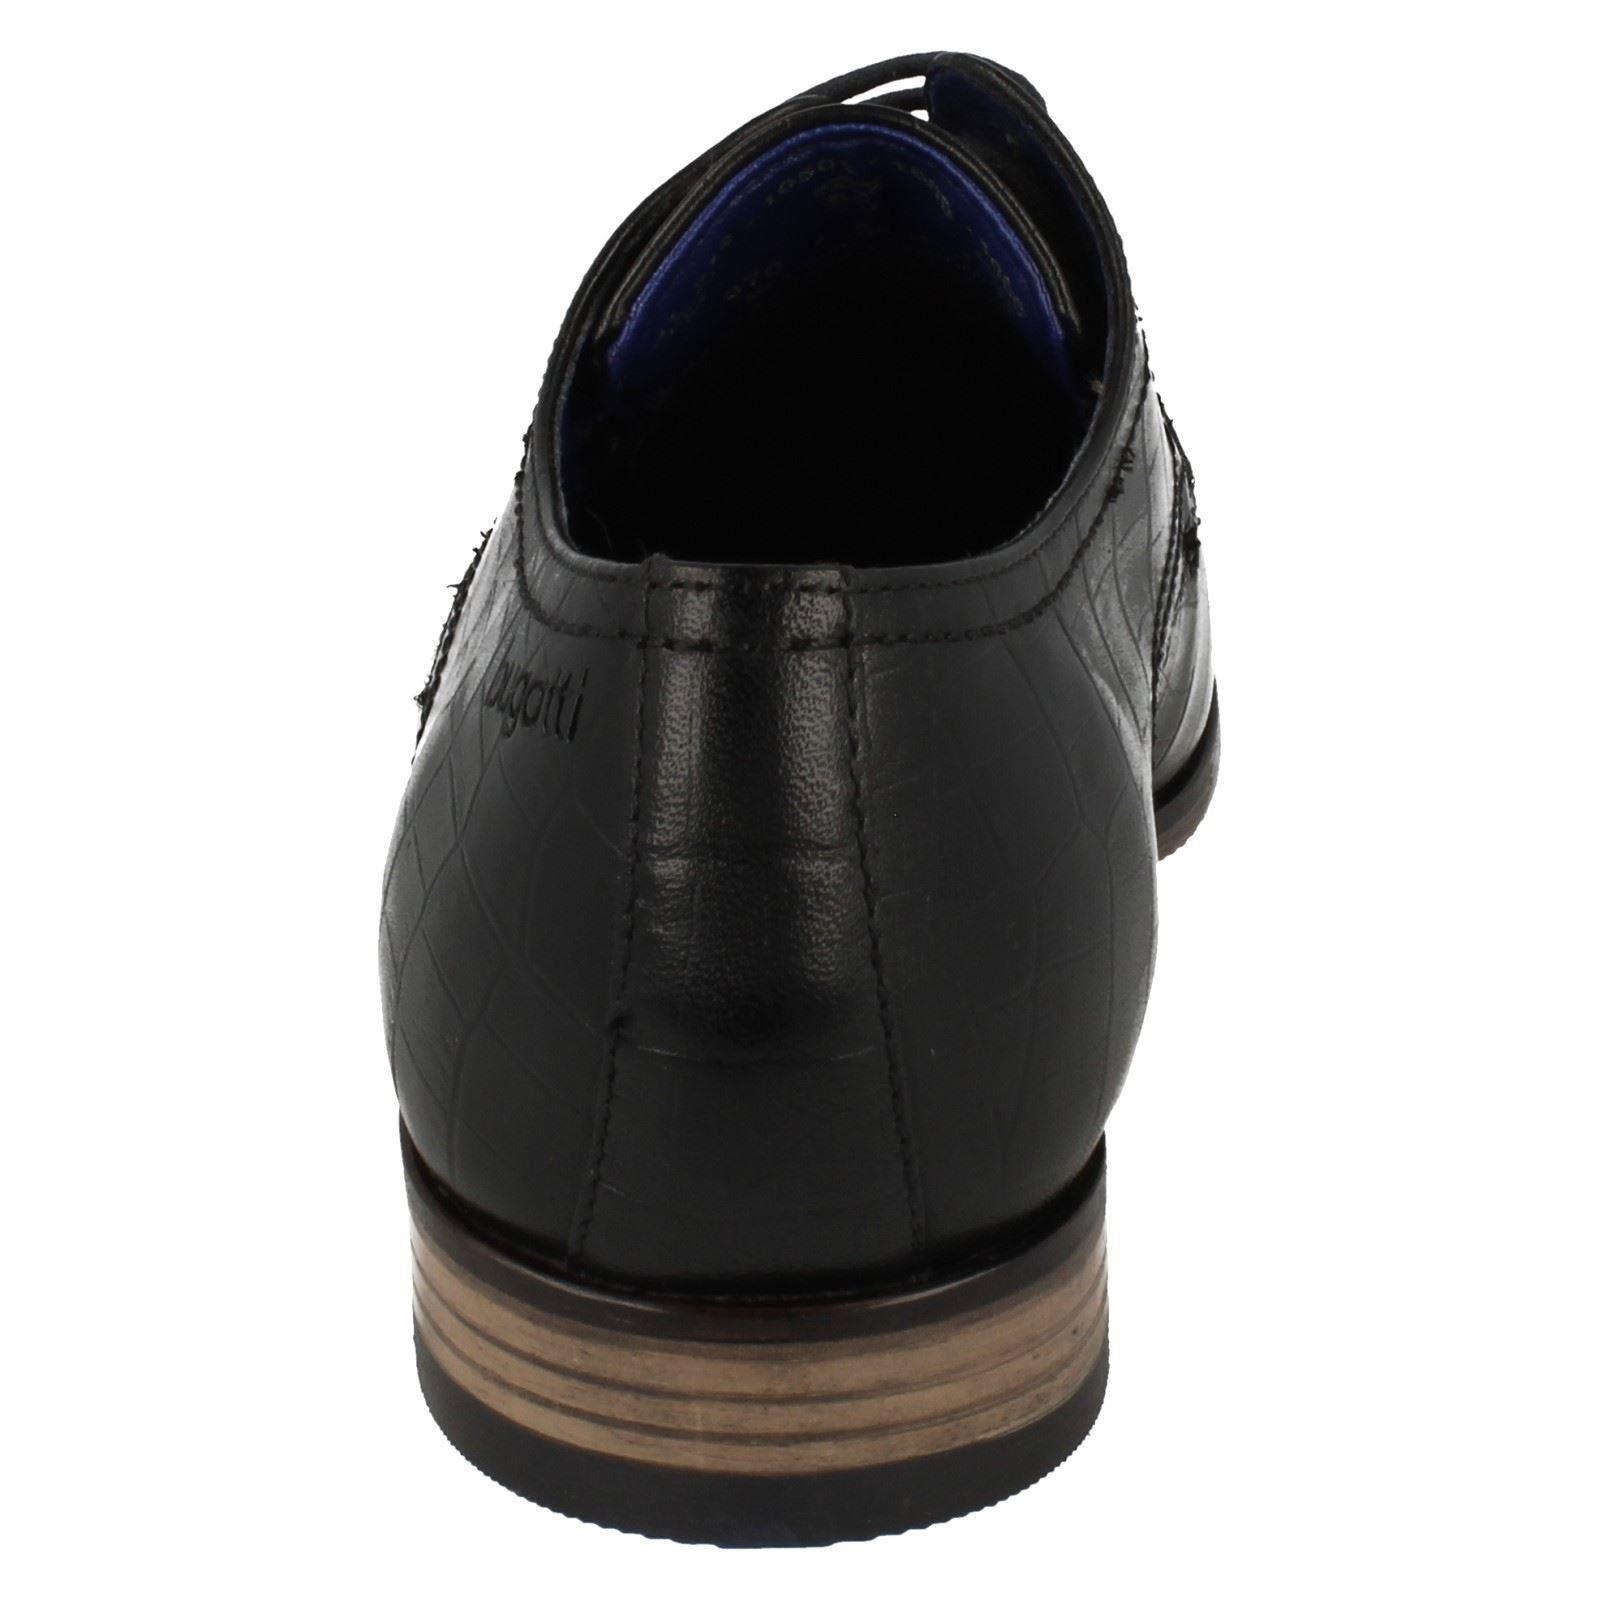 Mens Bugatti Smart Formal '312-10501' Lace Up schuhe '312-10501' Formal 35668f